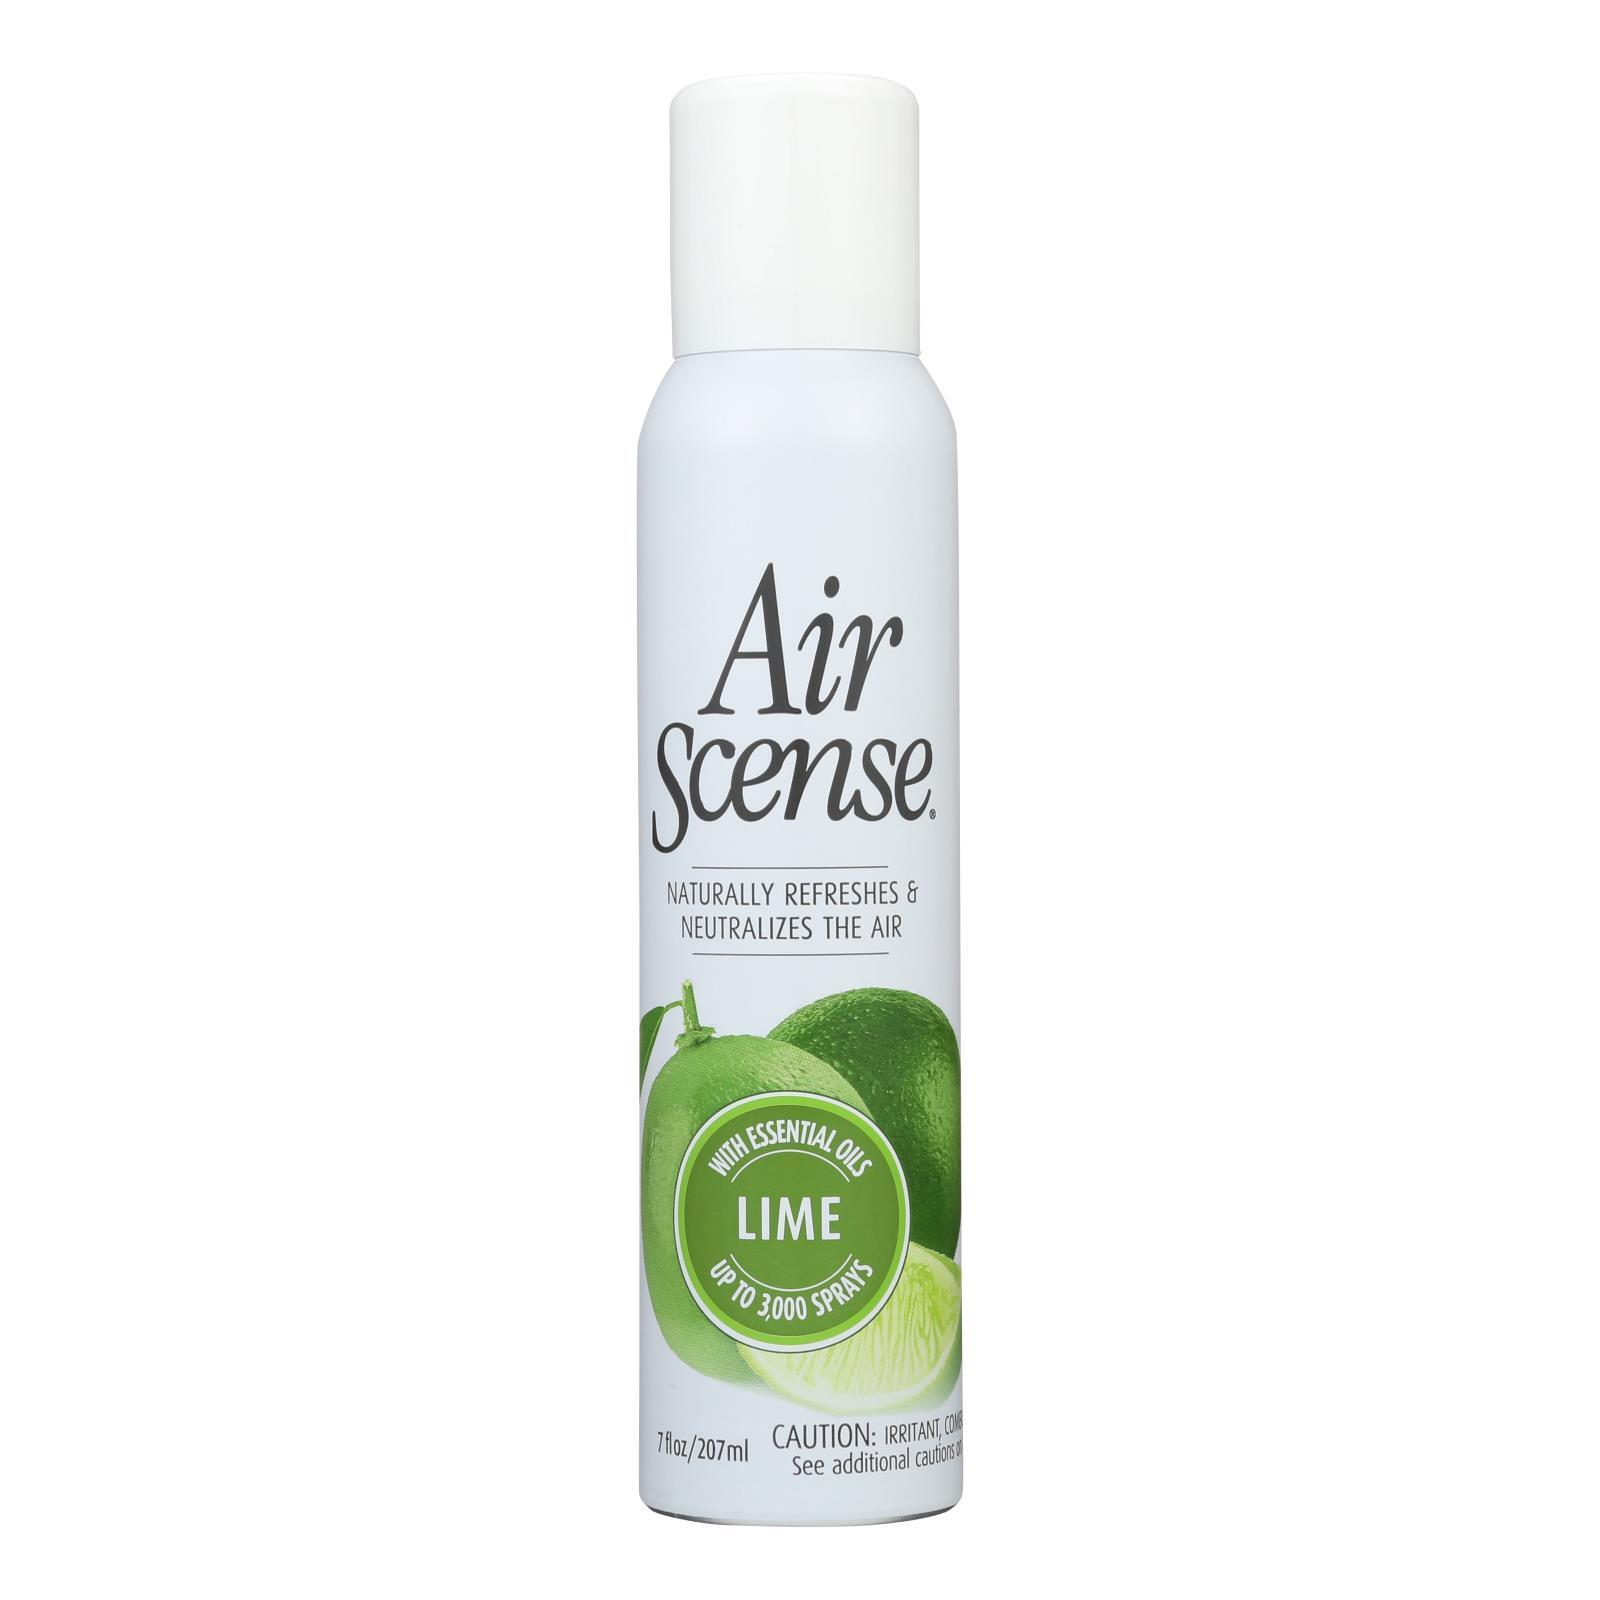 Air Scense Air Freshener - Lime - Case of 4 - 7 oz